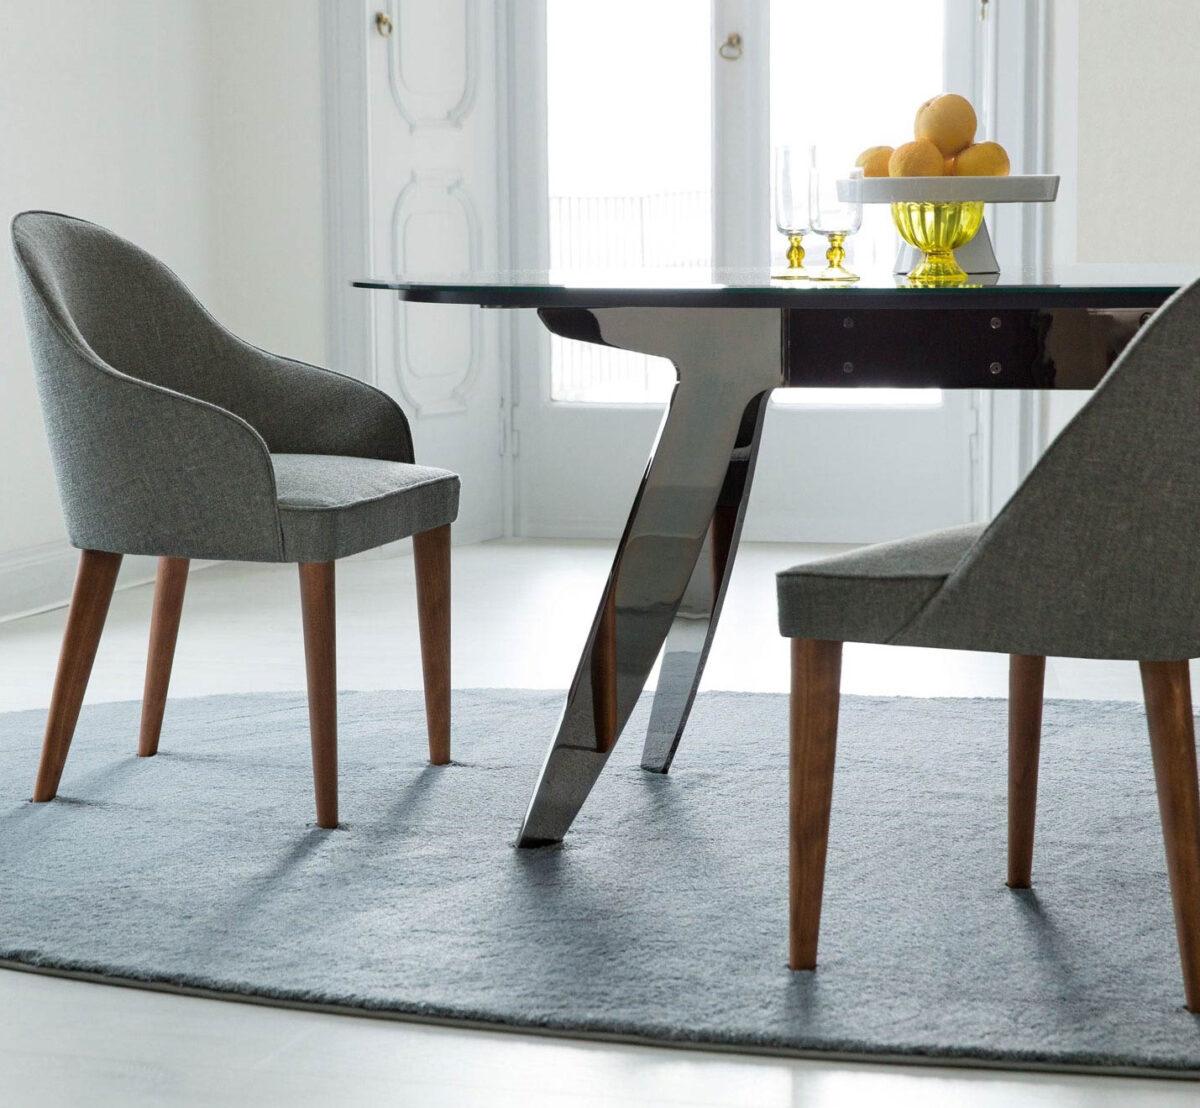 Sedie per la sala da pranzo moderna